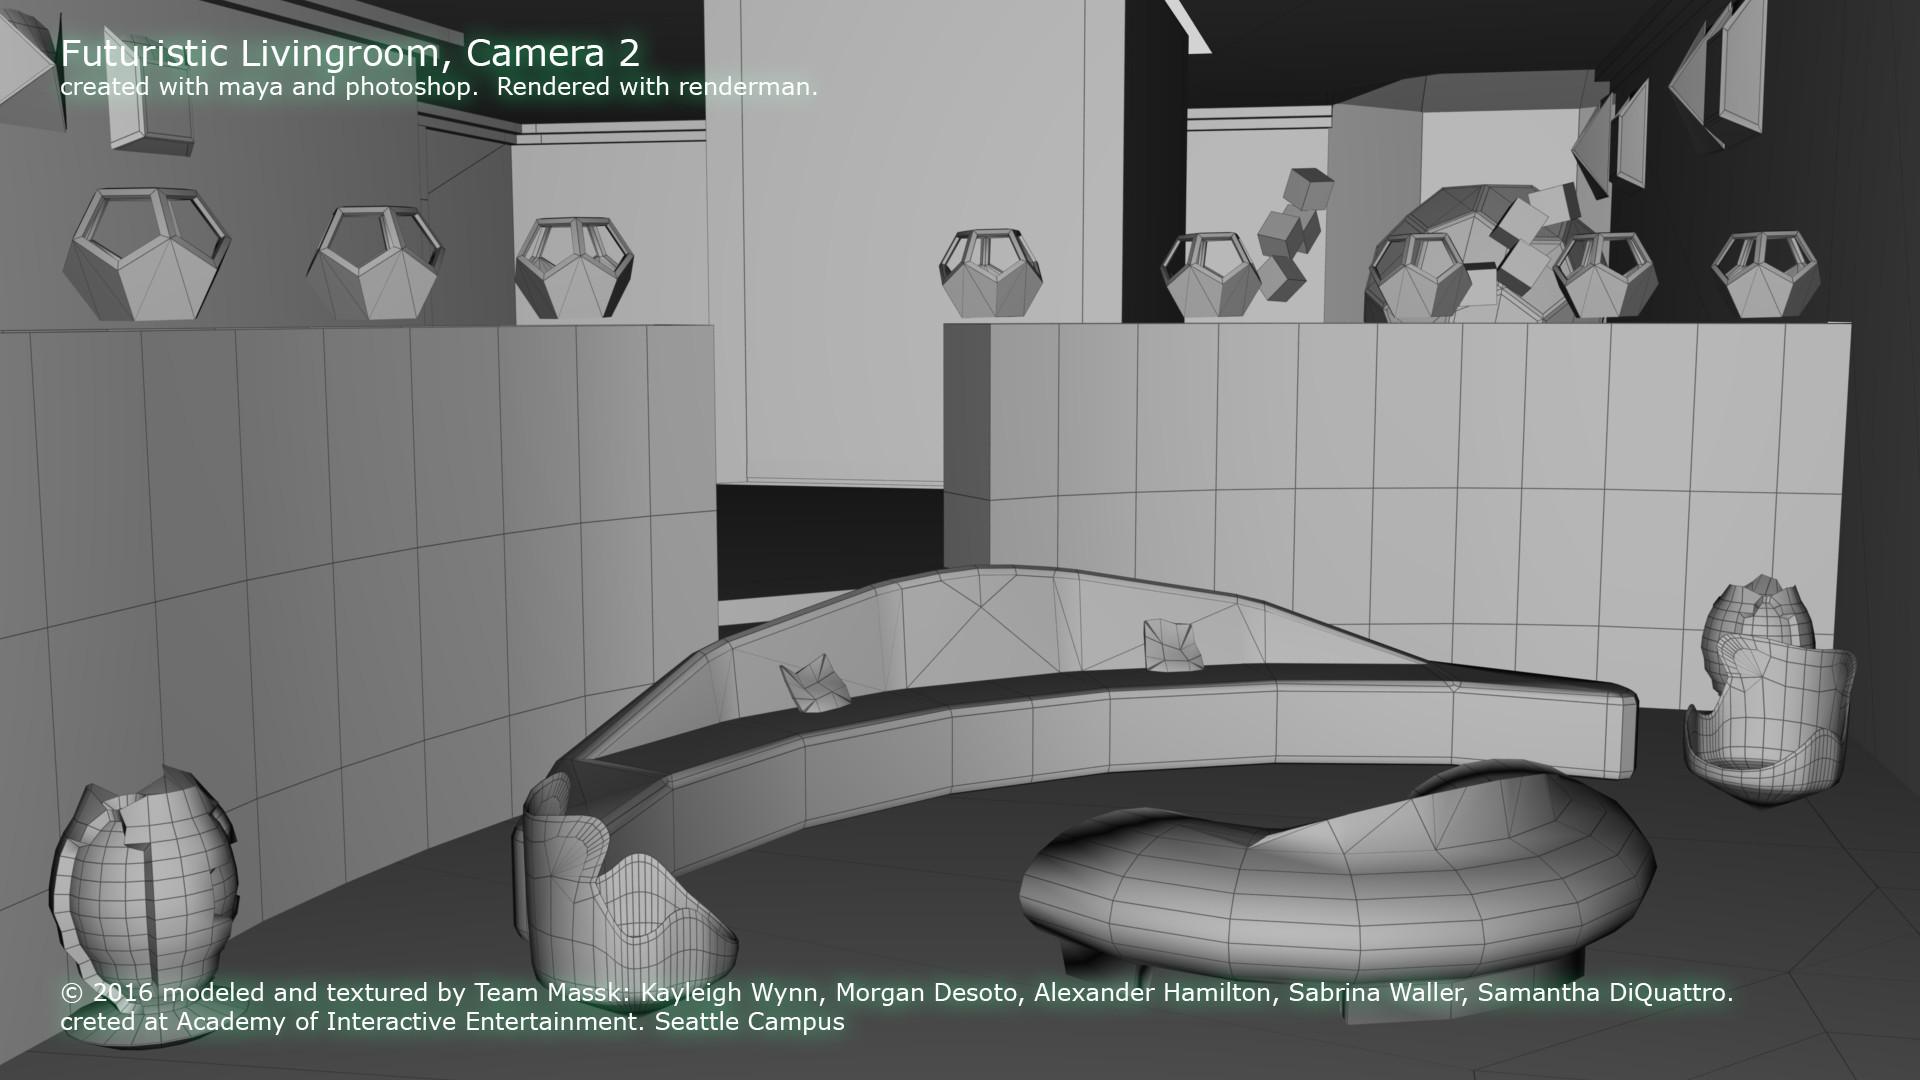 Futuristic Living Room Artstation Futuristic Living Room Alexander Hamilton